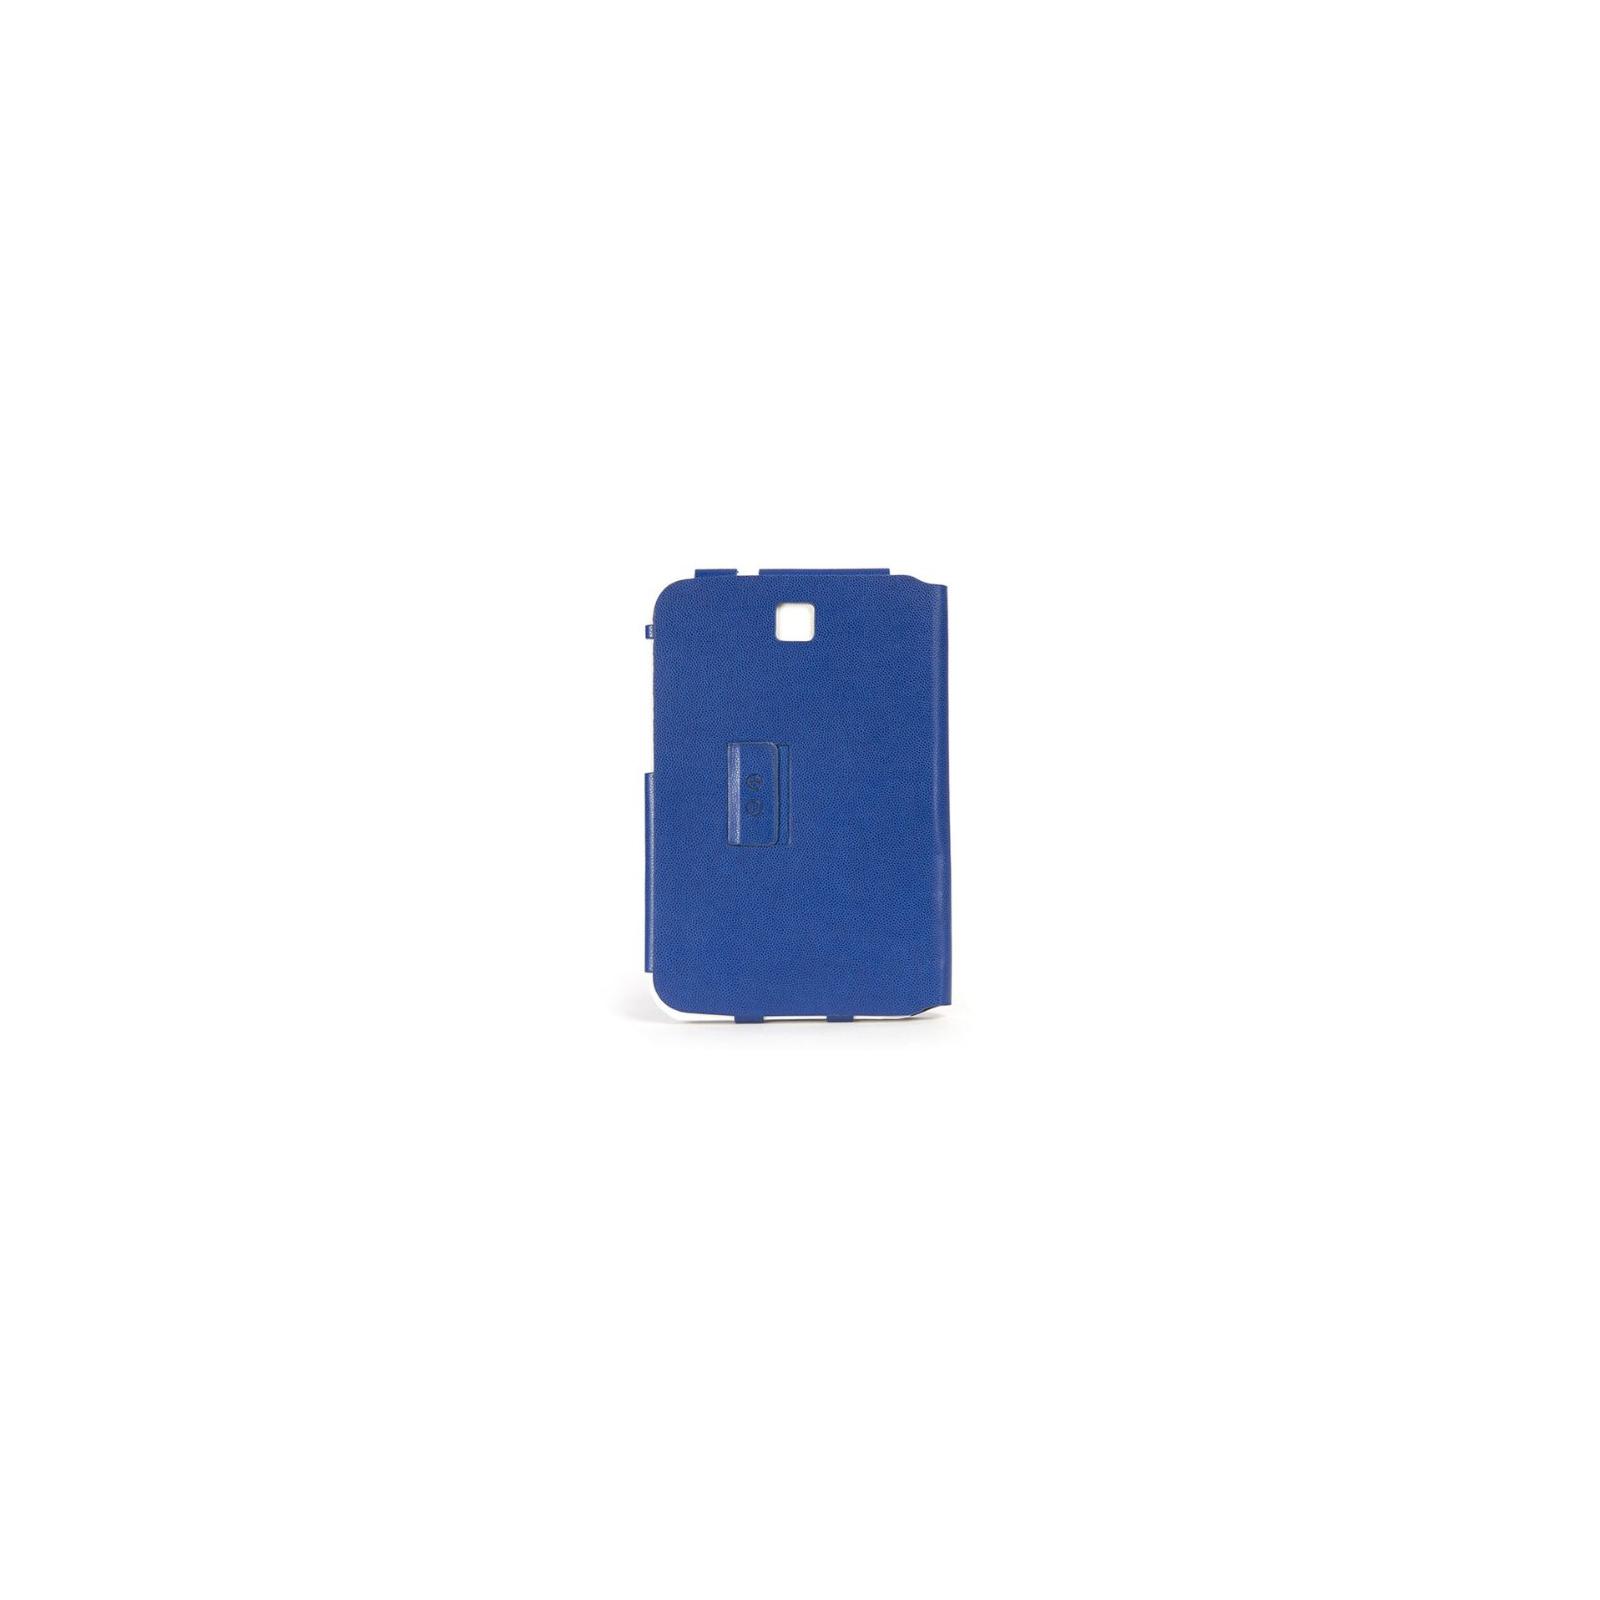 Чехол для планшета Tucano Galaxy Tab 3 8.0 Leggero Blue (TAB-LS38-B) изображение 2